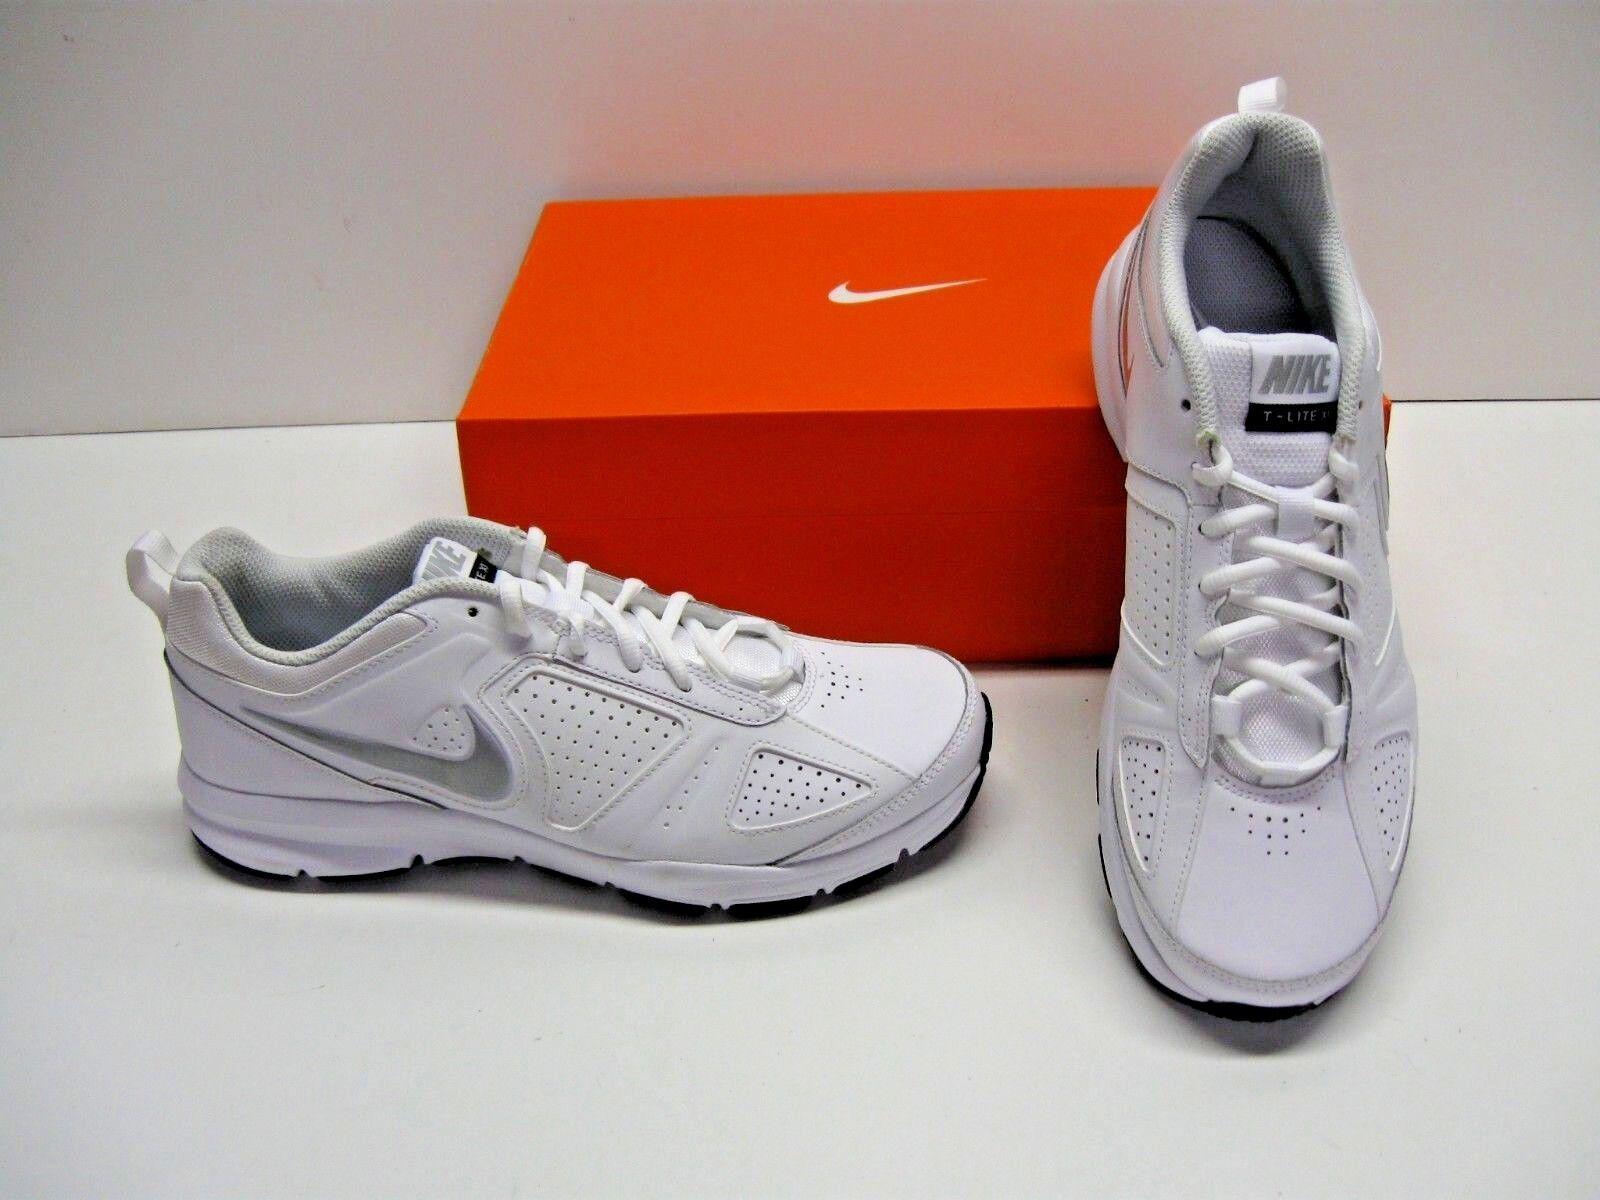 Nike T-Lite XI 11 Running Cross Training White Silver Sneakers Shoes Mens 10.5